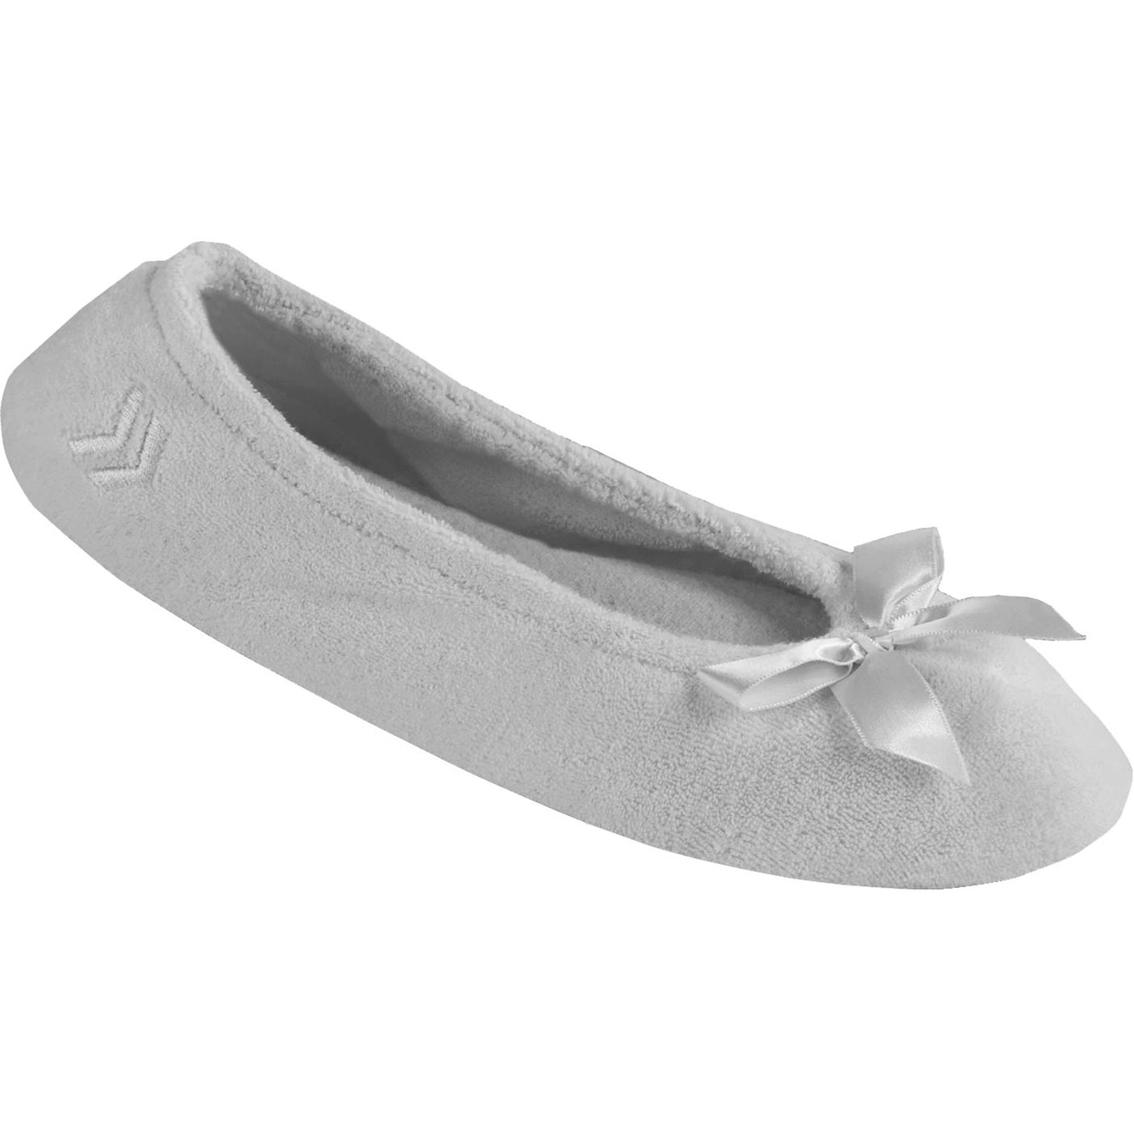 475d75efb1b6 Isotoner Classic Terry Ballerina Slippers